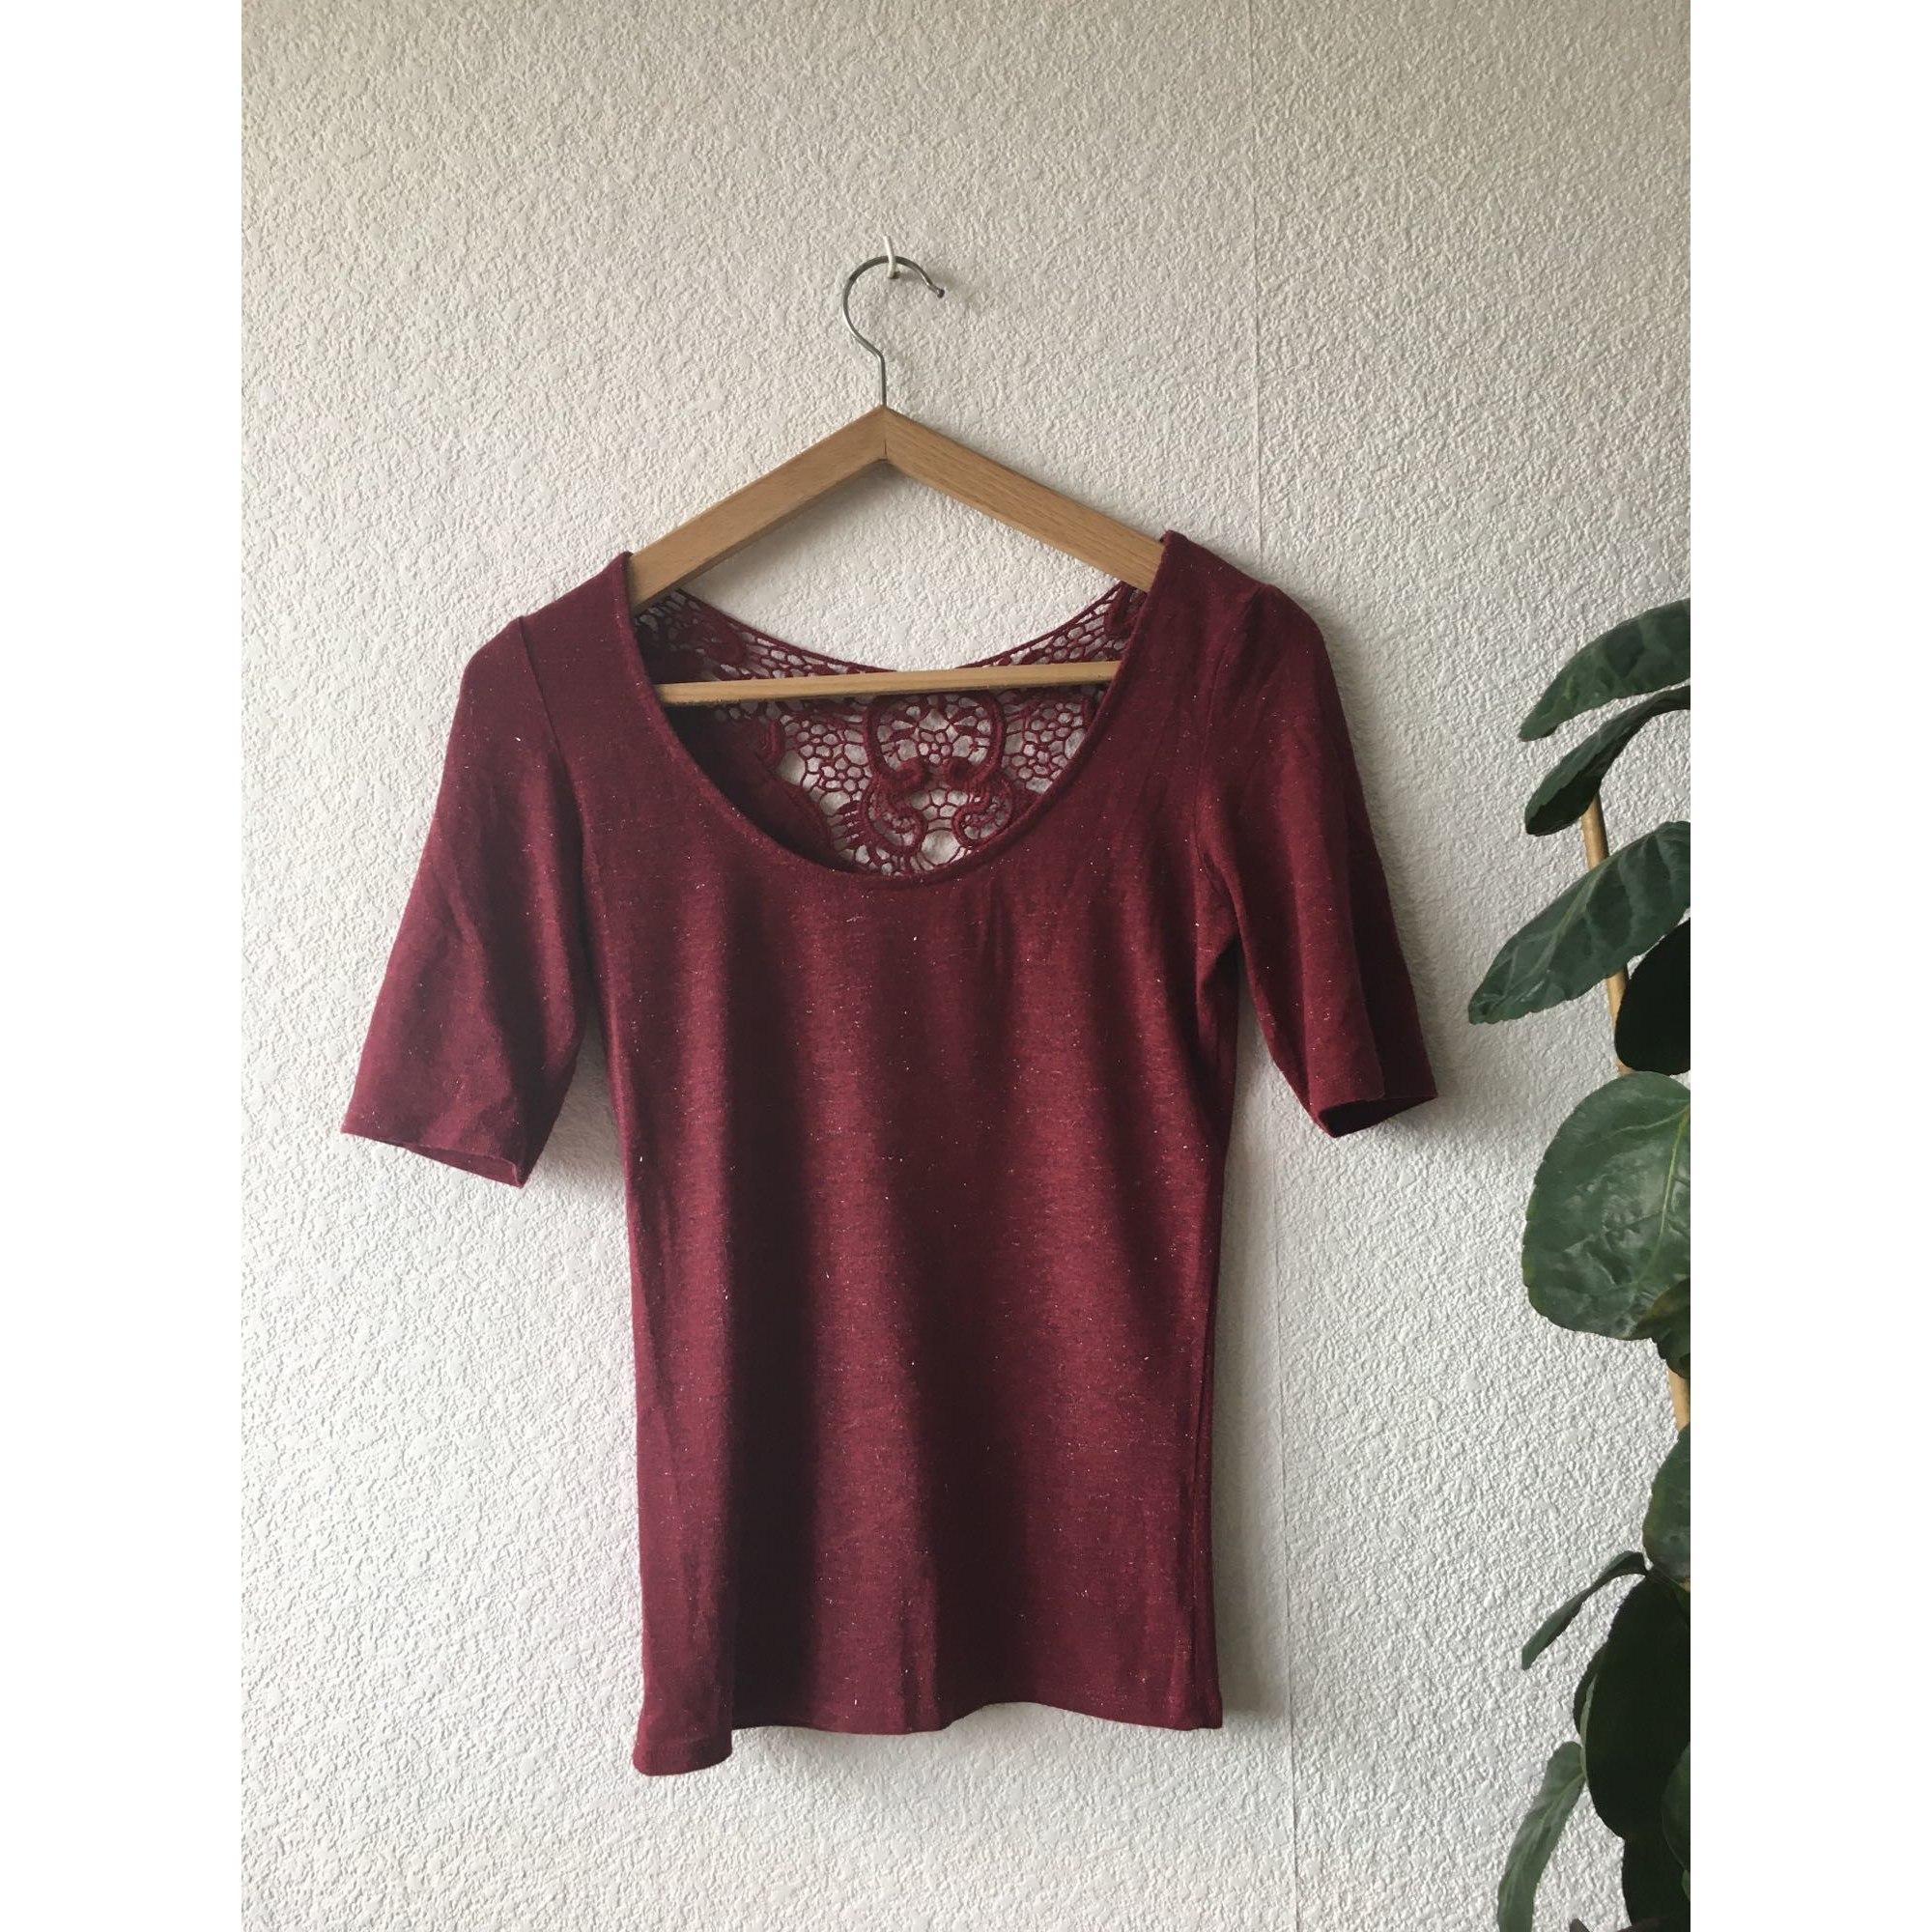 Top, tee-shirt NAF NAF Rouge, bordeaux